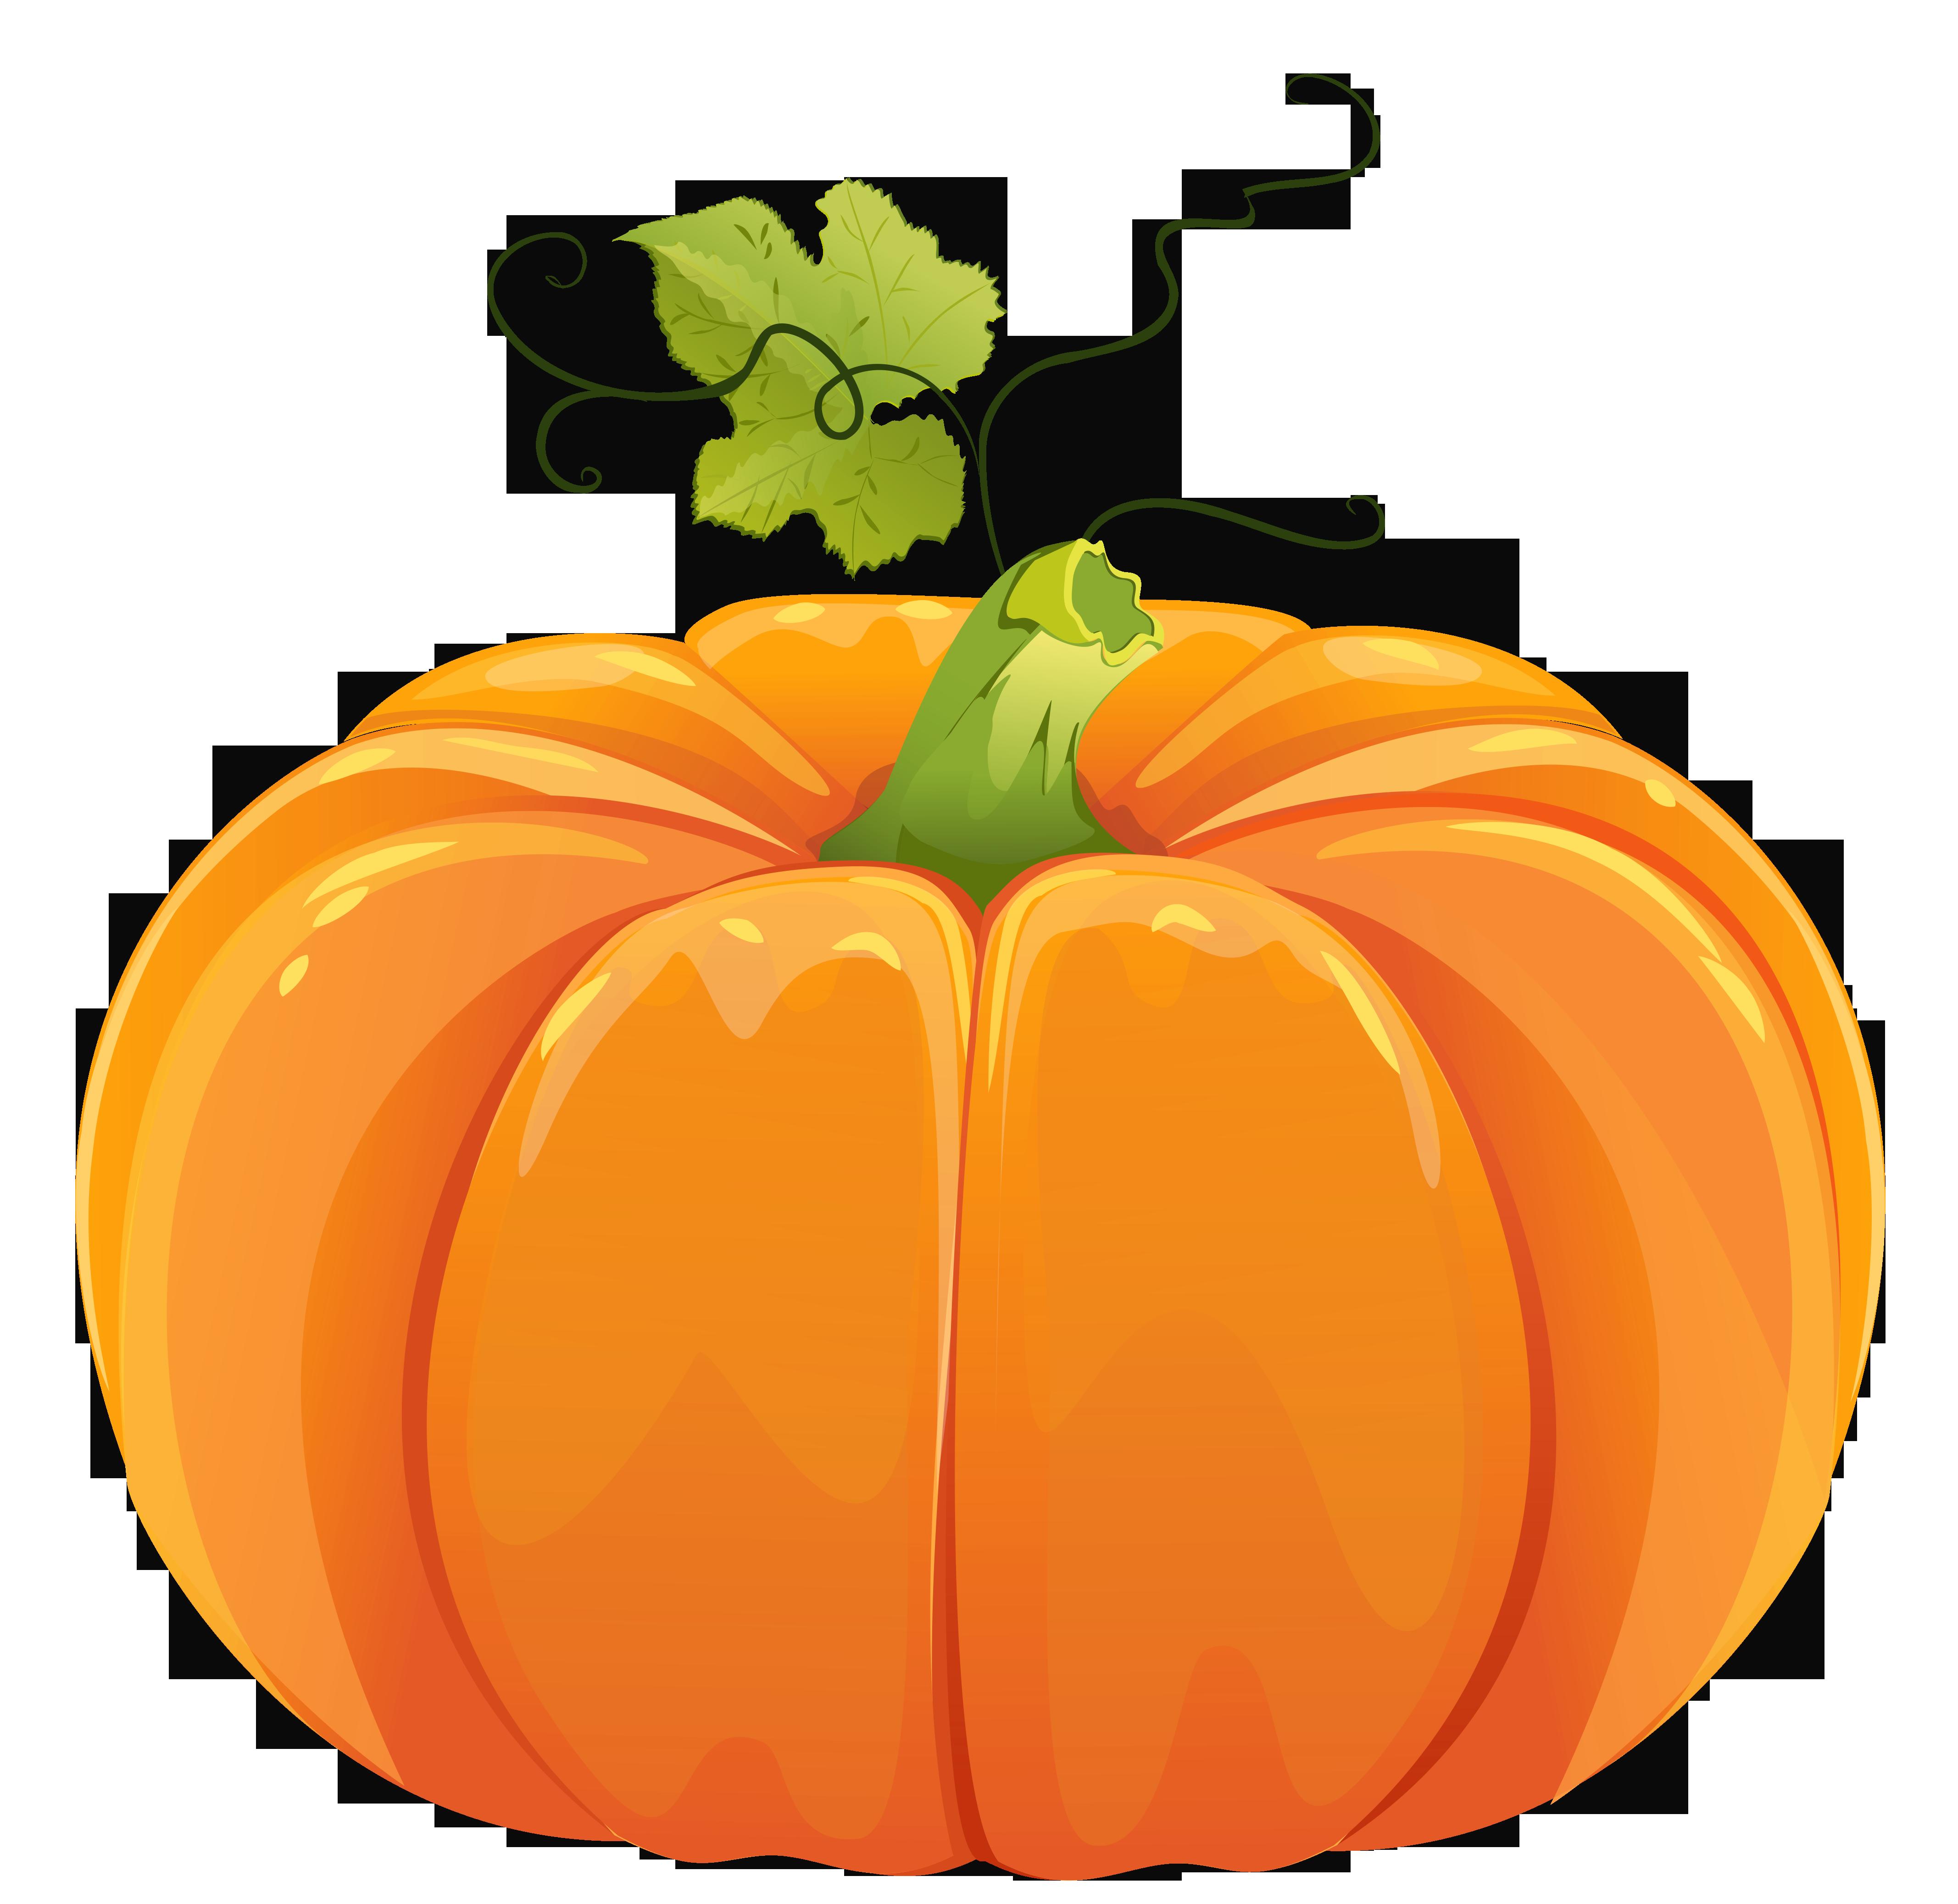 Free Clipart Pumpkins - clipartall-Free Clipart Pumpkins - clipartall-3